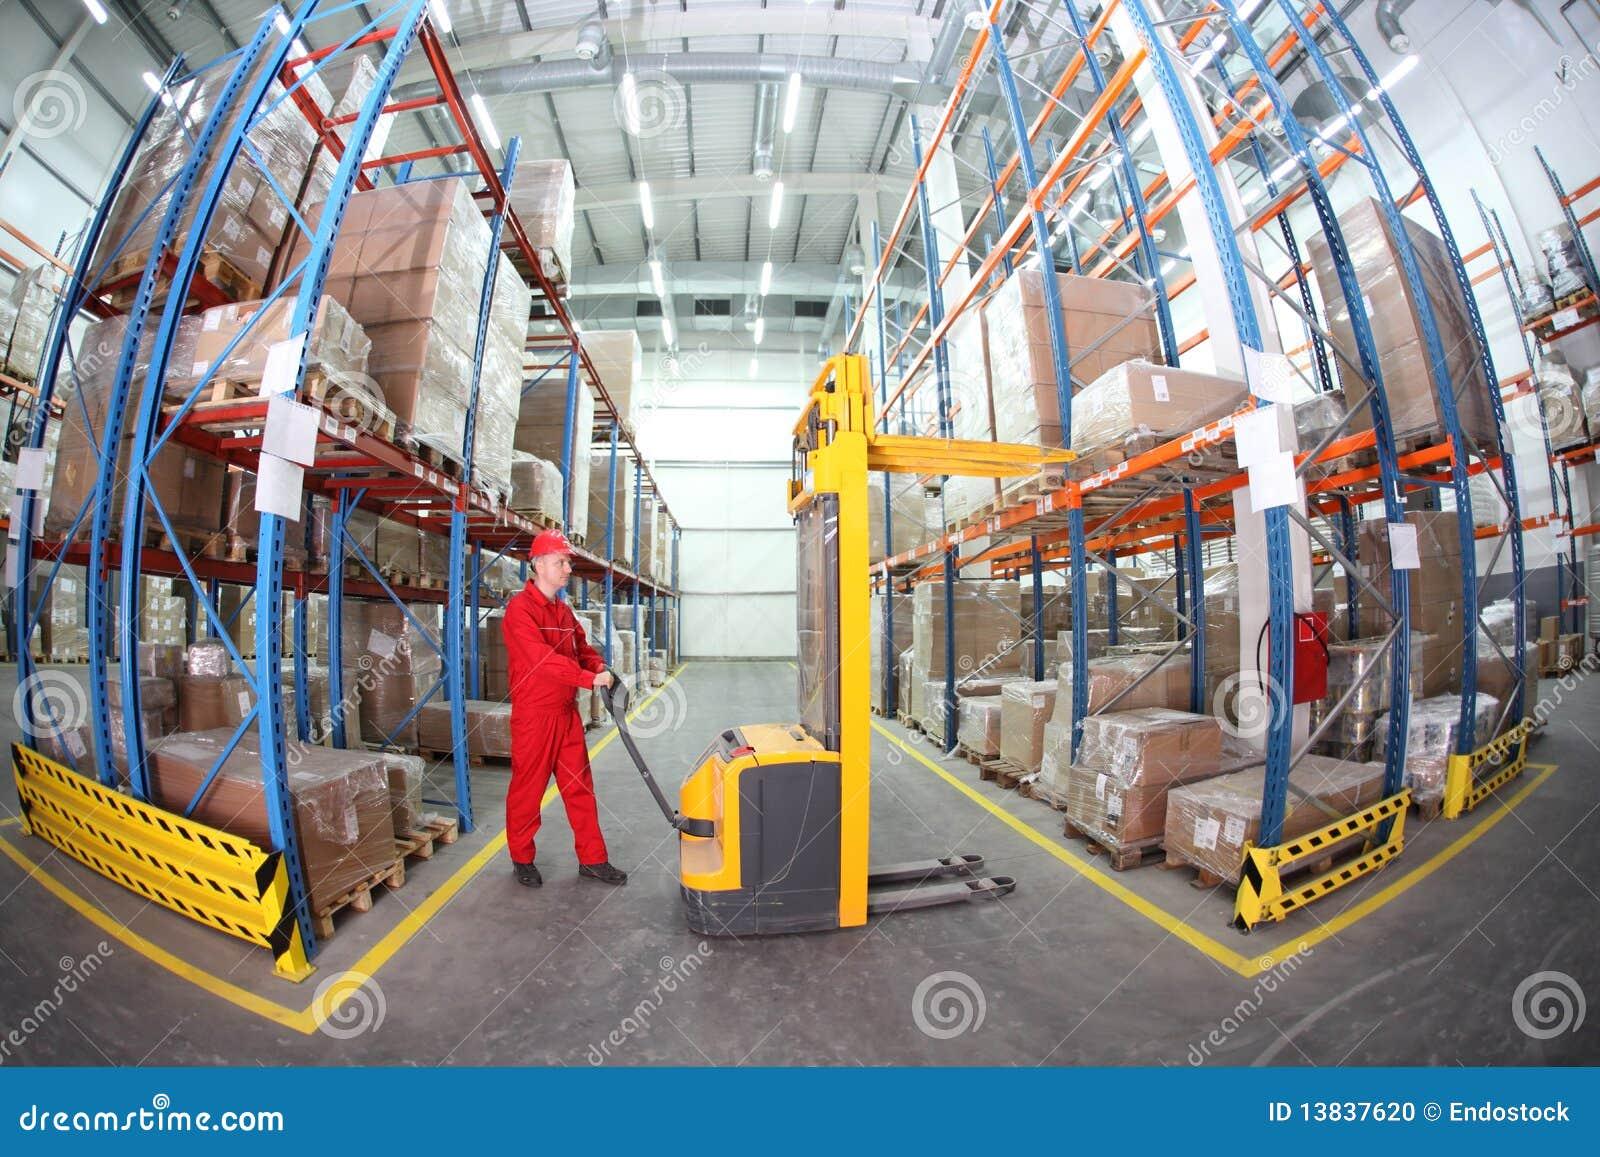 warehousing - manual forklift operator at work in